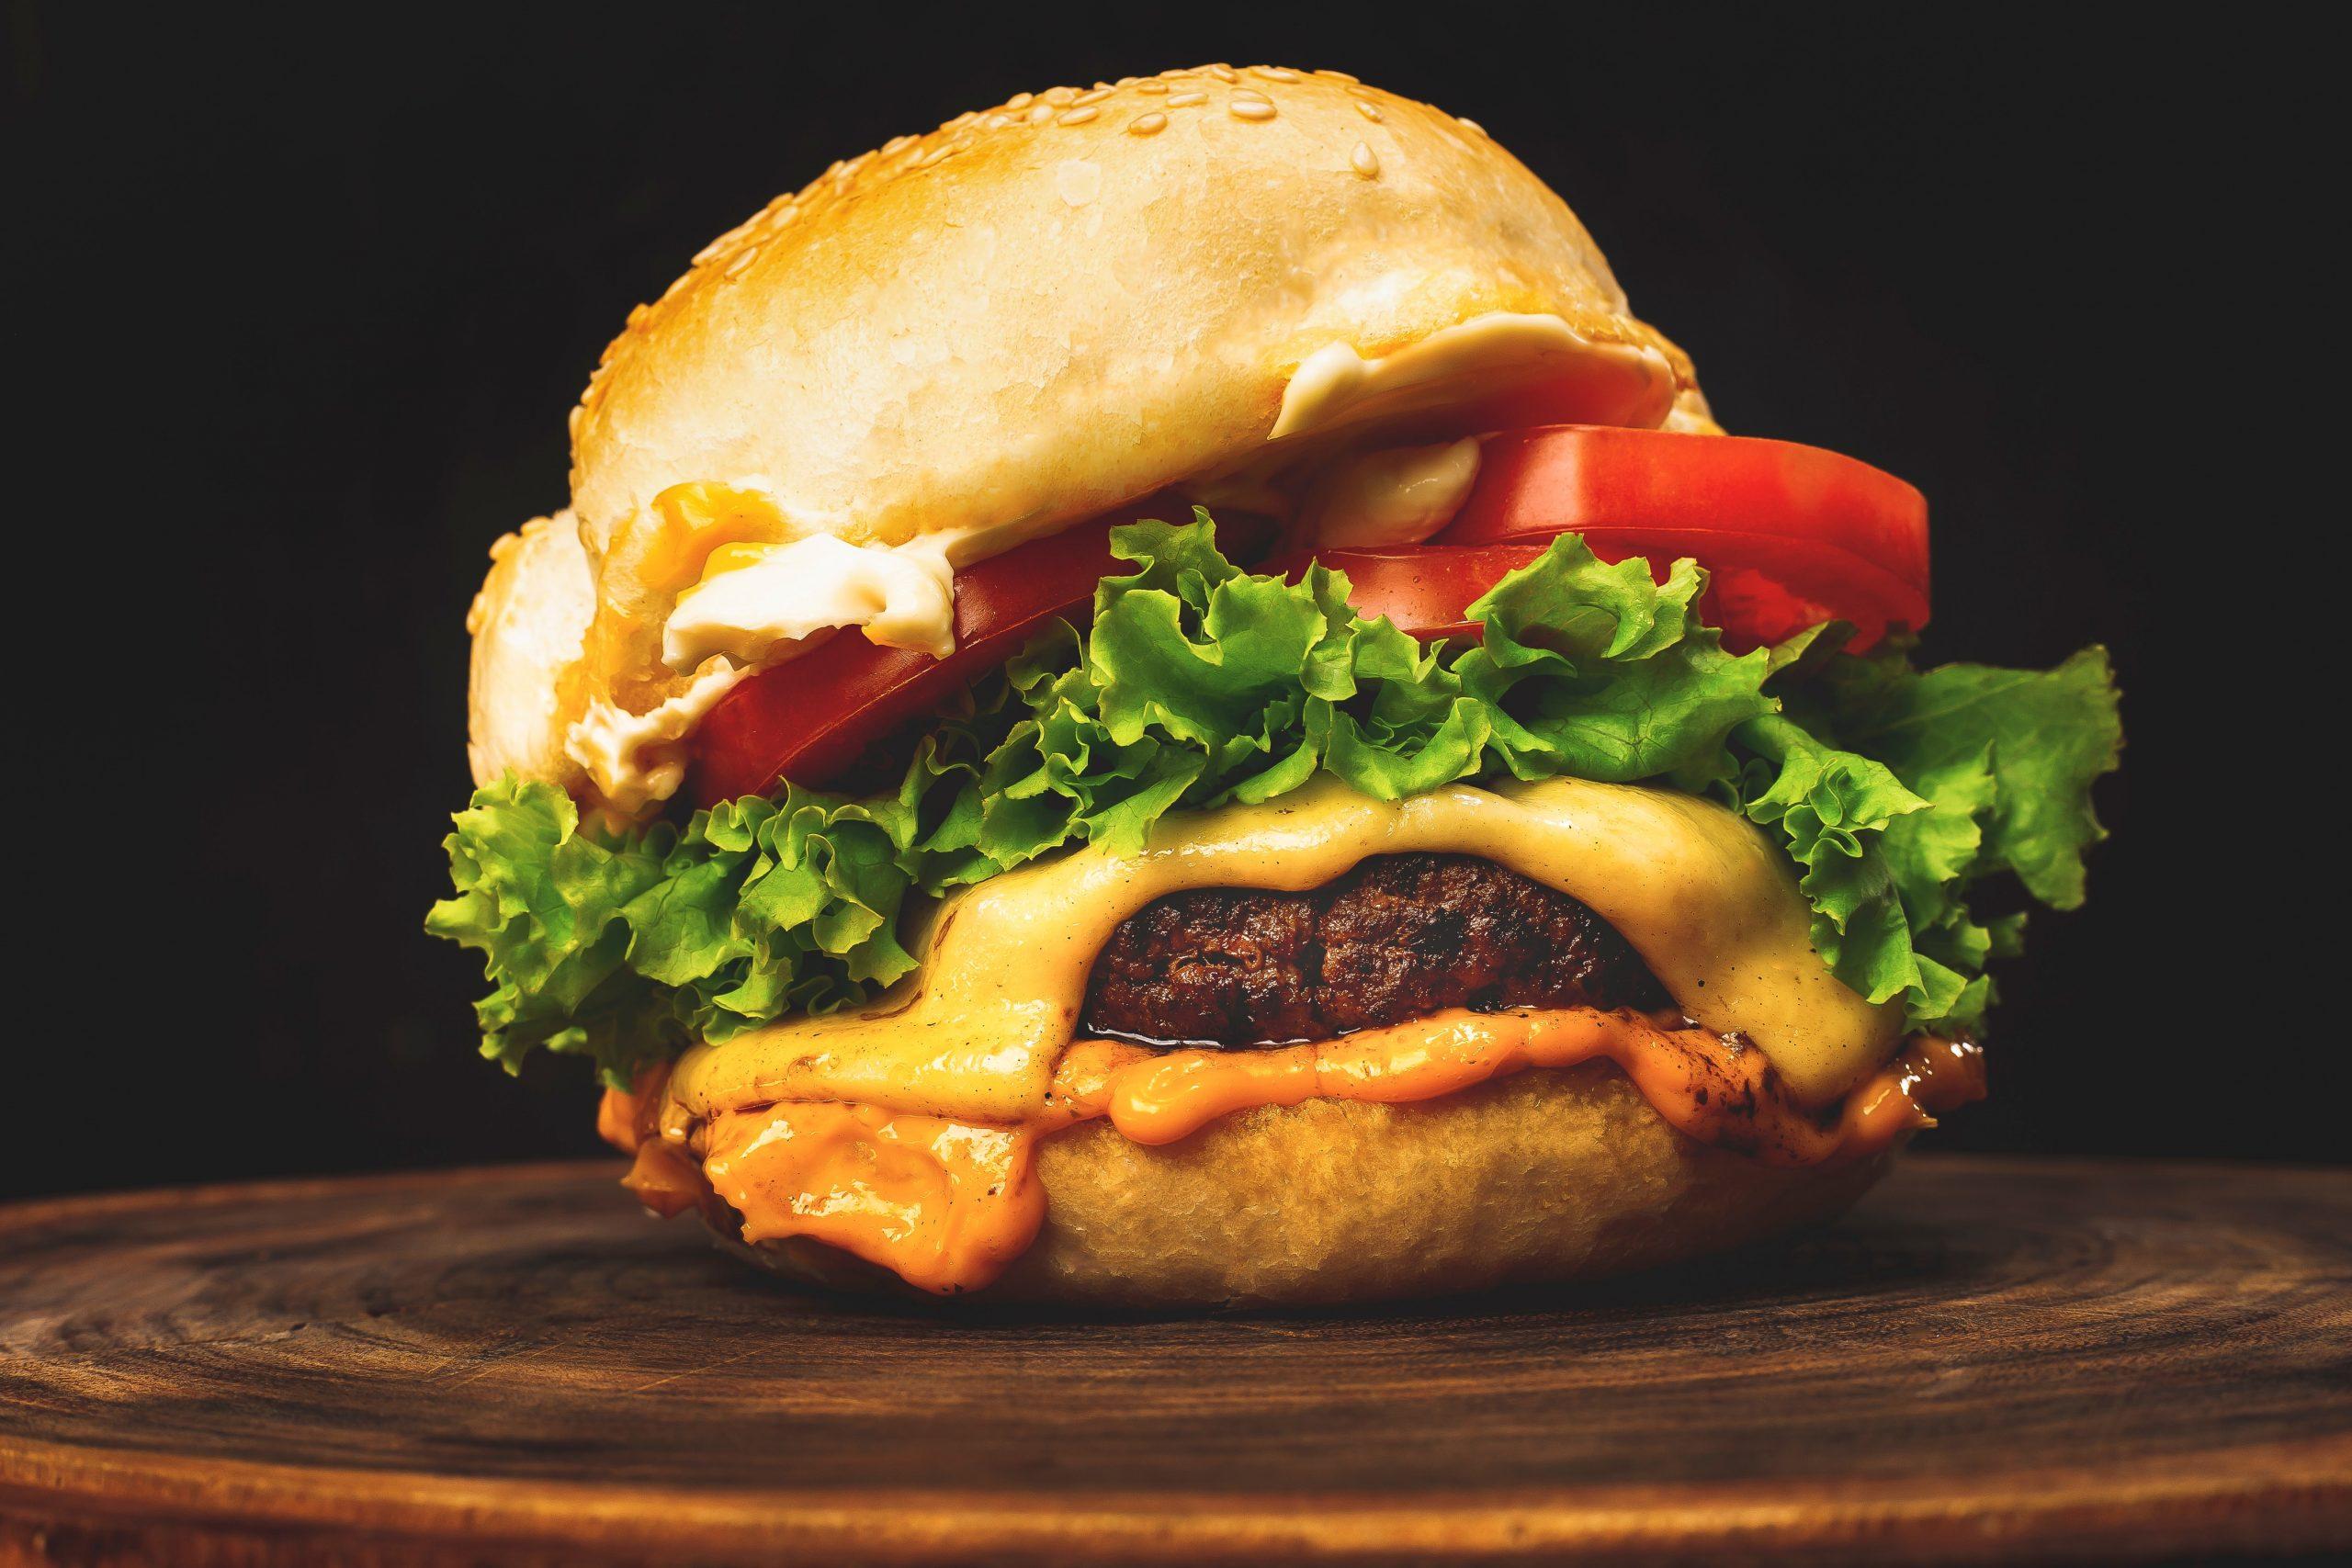 Hambúrger artesanal gourmet em uma tábua